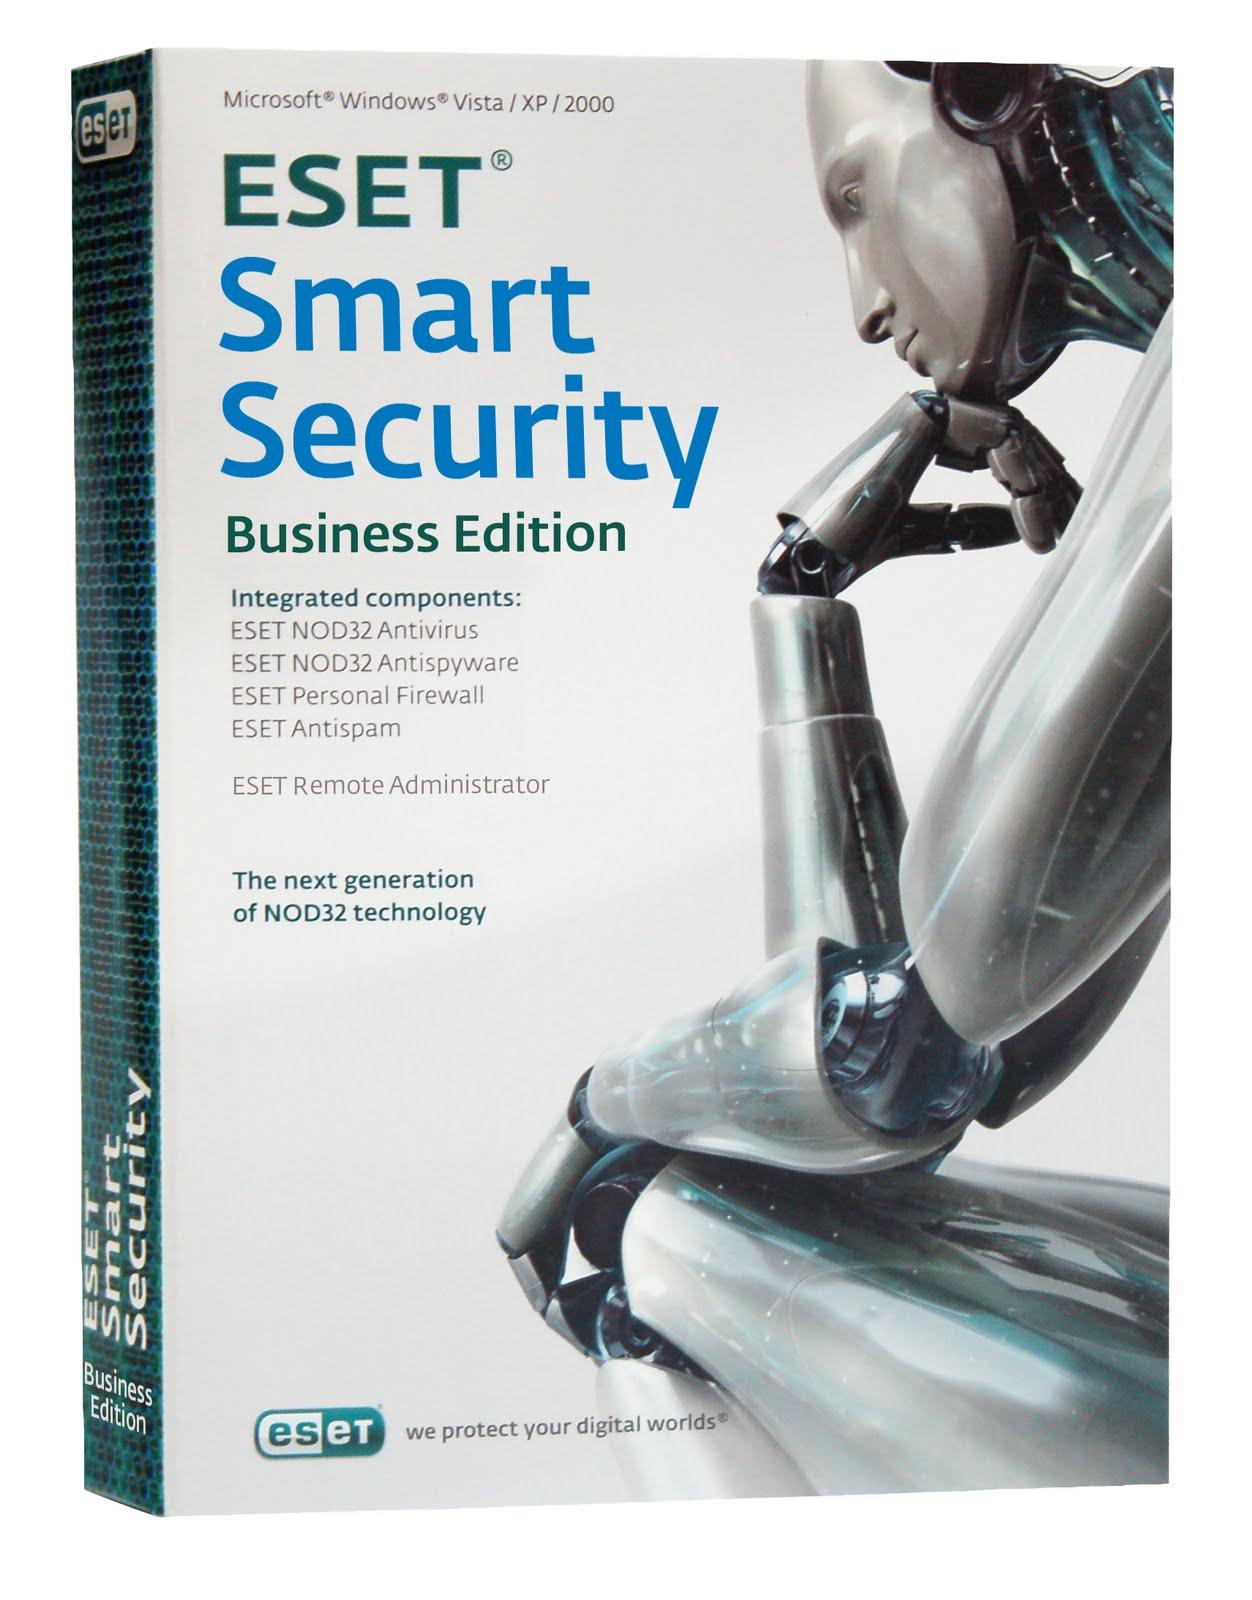 eset smart security softpedia